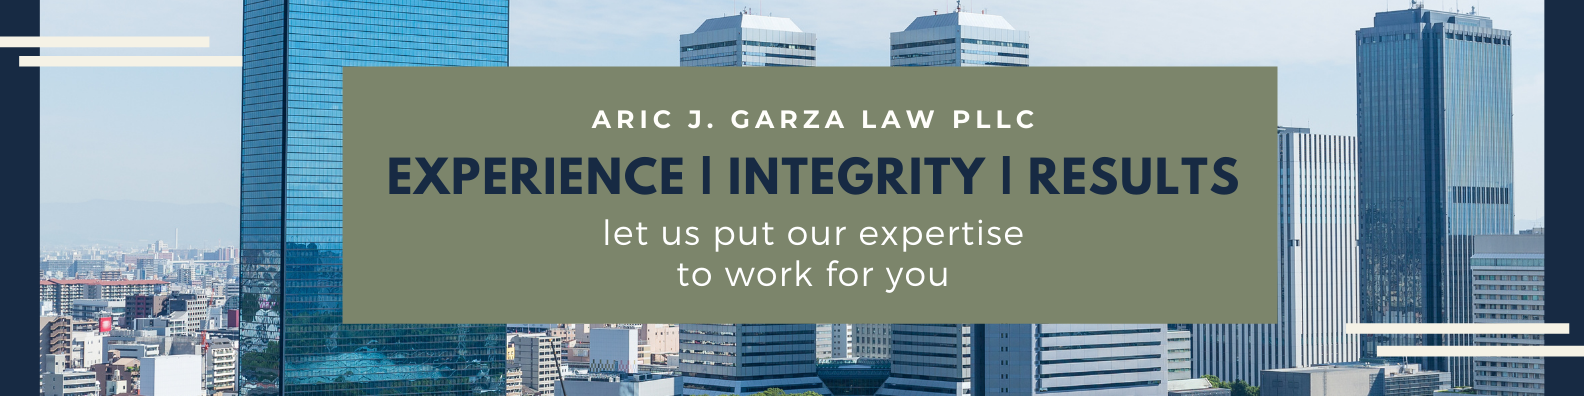 Aric J. Garza Law PLLC